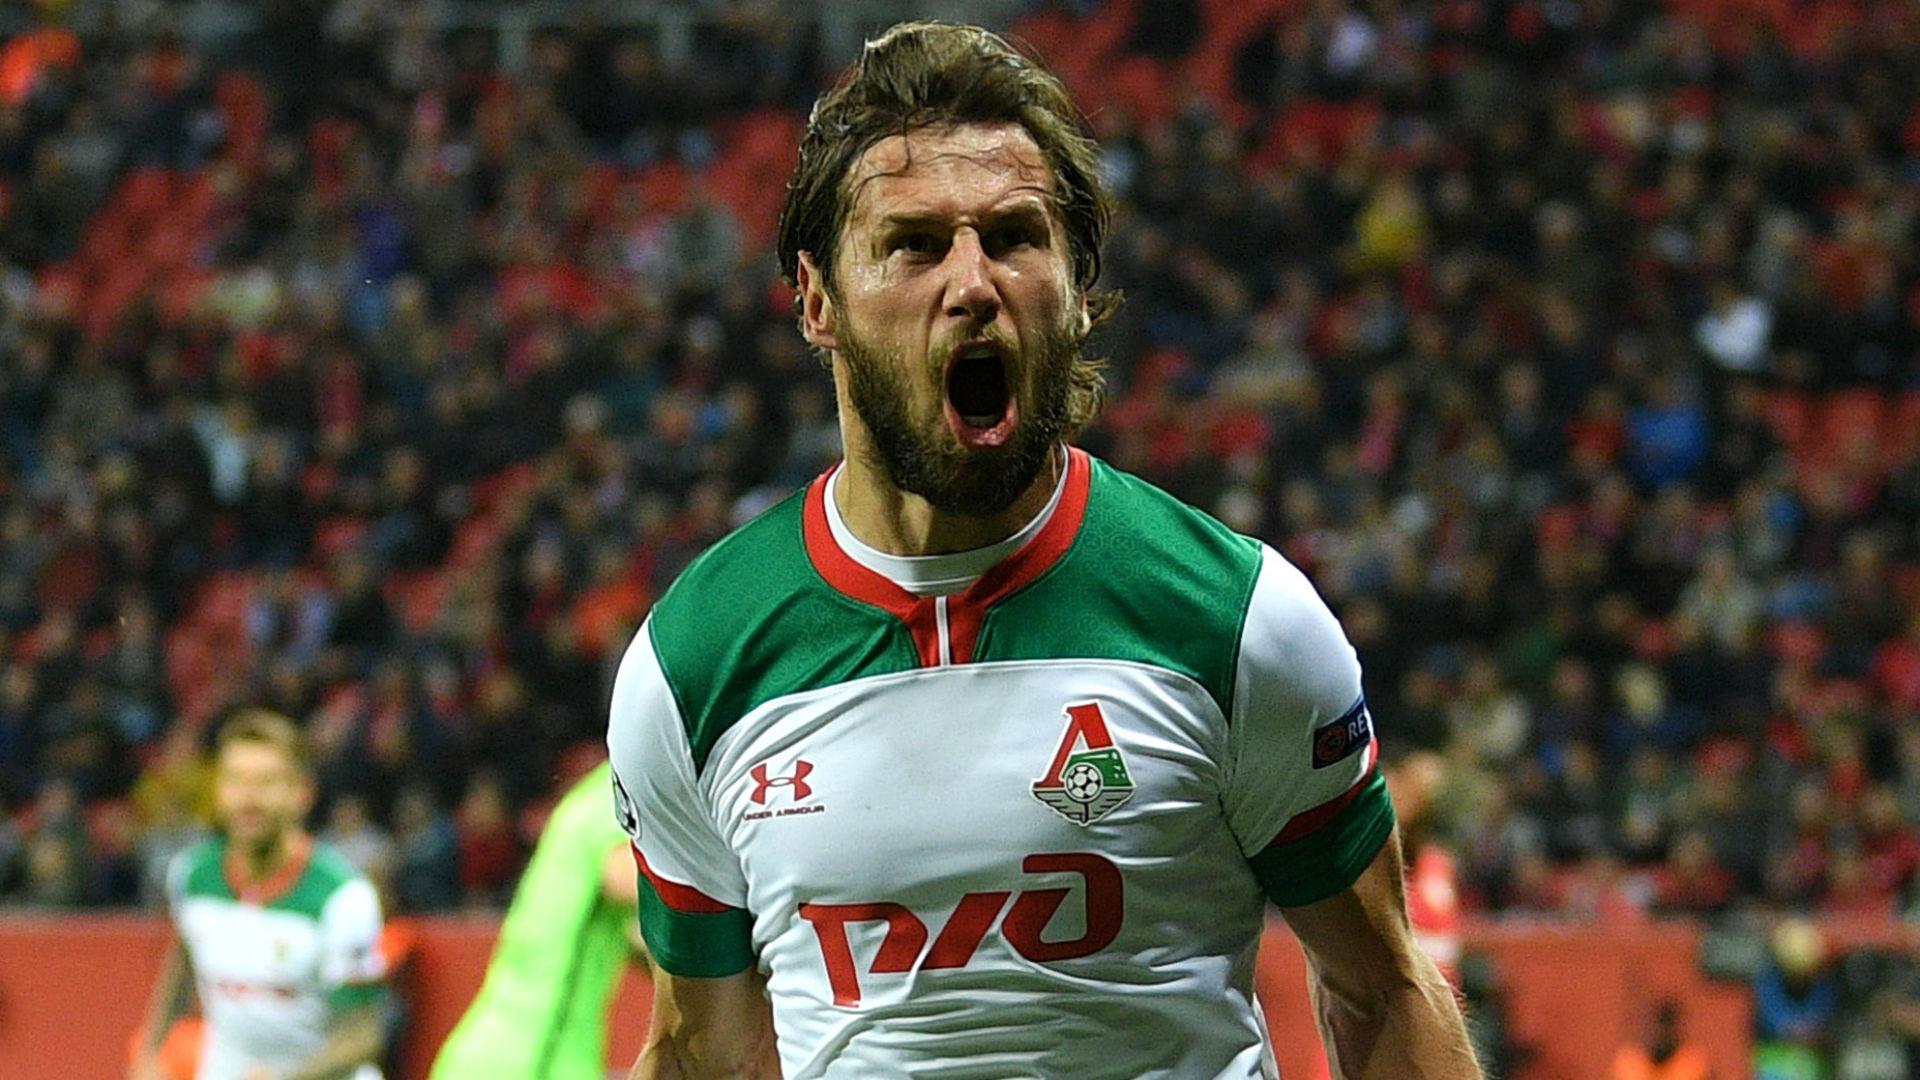 Bayer Leverkusen 1-2 Lokomotiv Moscow: Krychowiak and Barinov secure rare away win